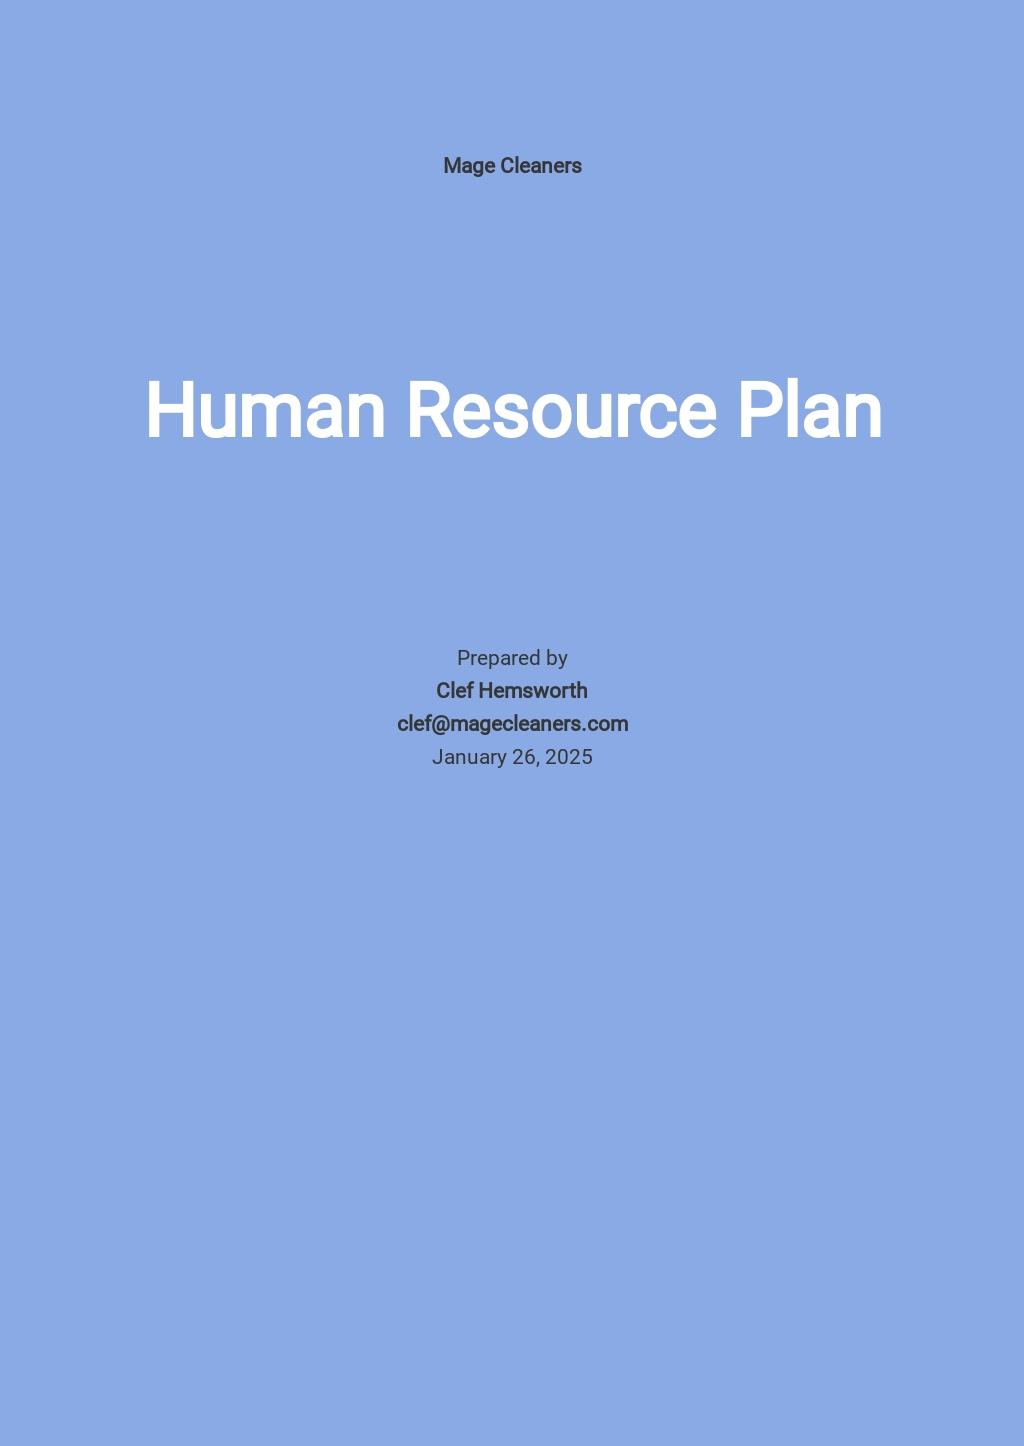 Human Resource Planning Template.jpe